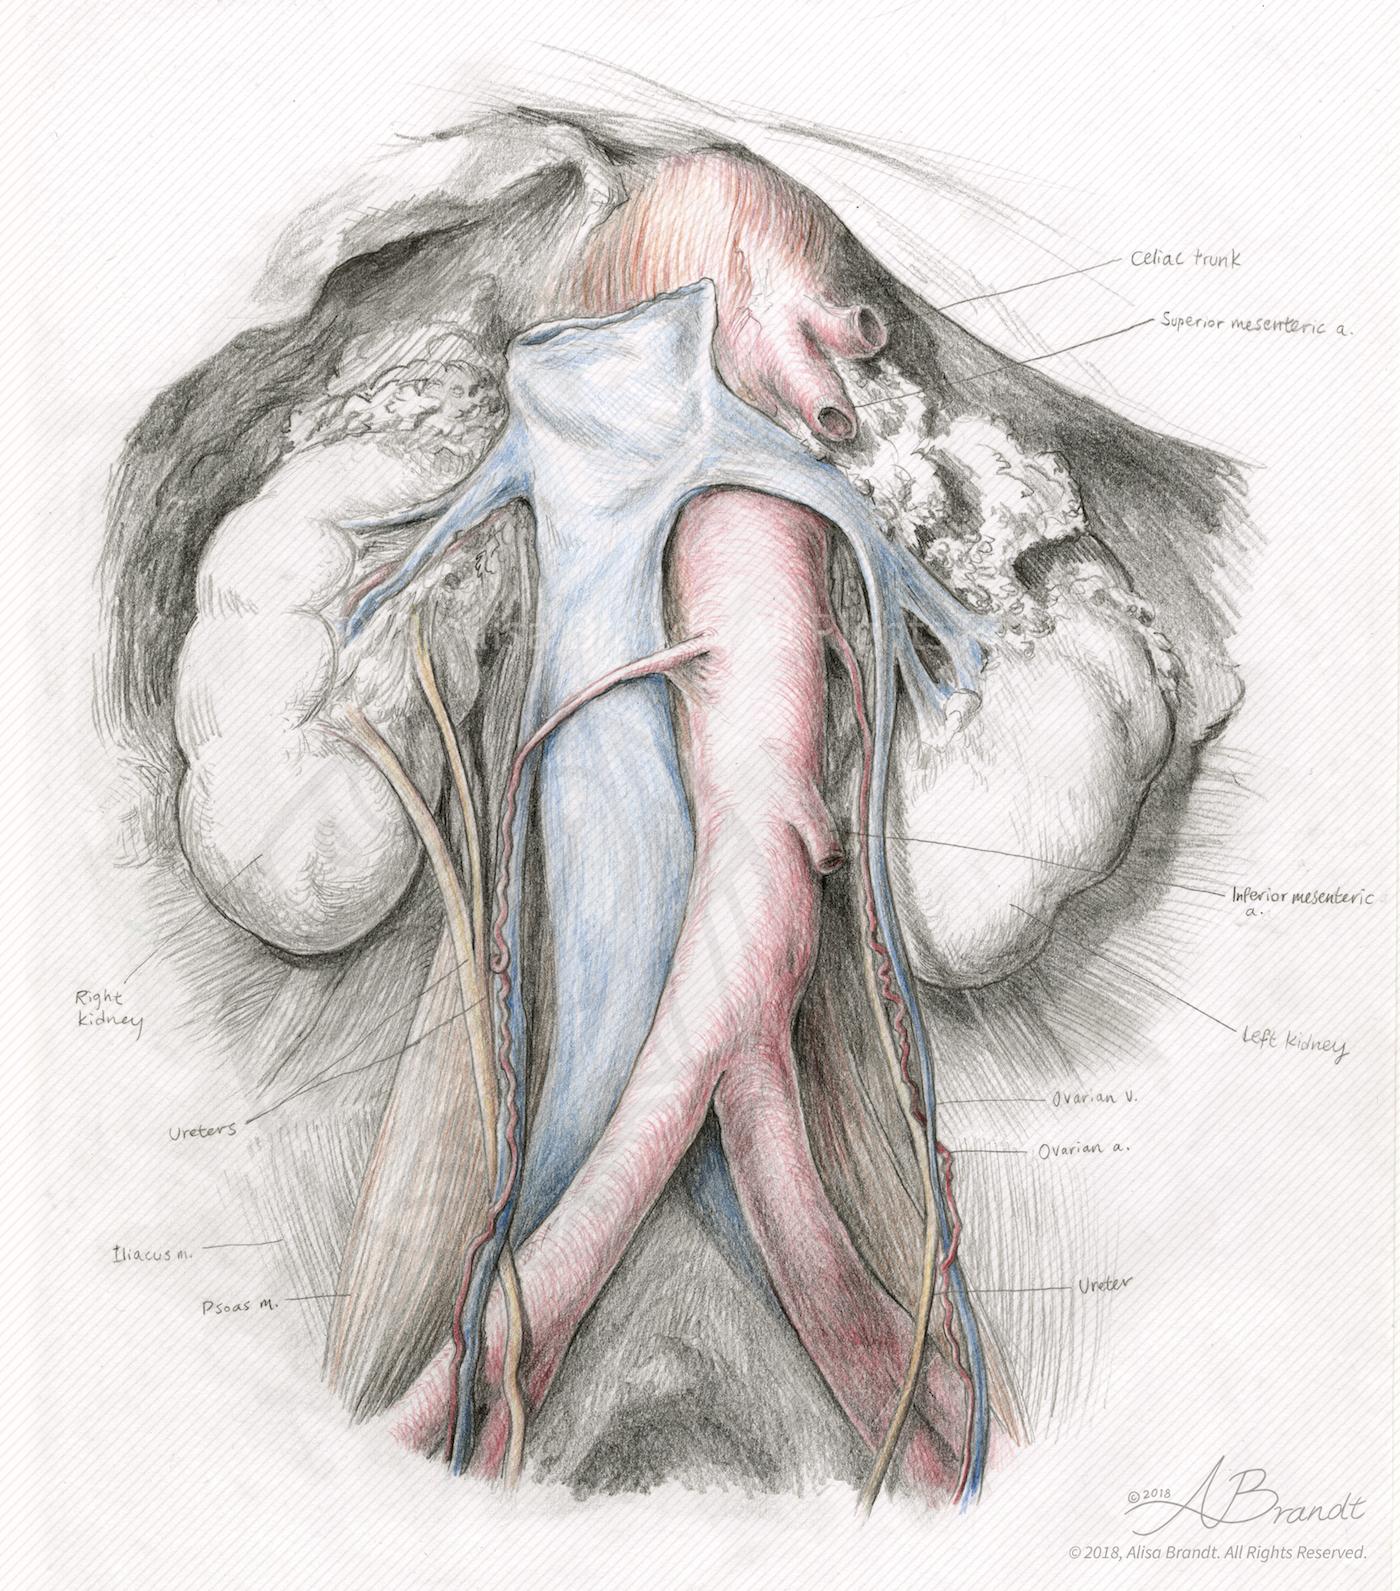 Anatomical sketch of kidneys